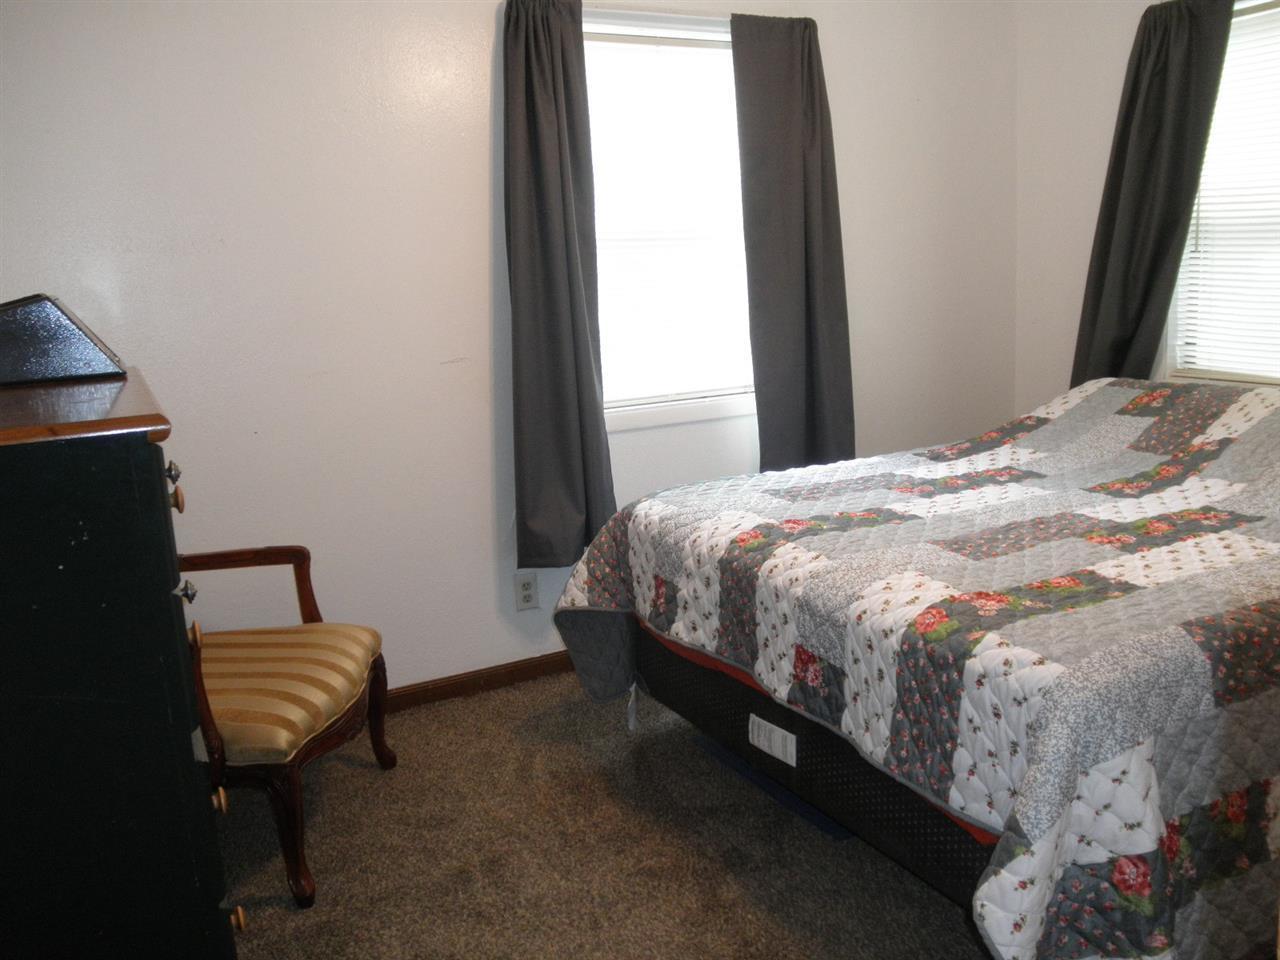 Sold Cross Sale W/ MLS | 808 Gray  Ponca City, OK 74604 10